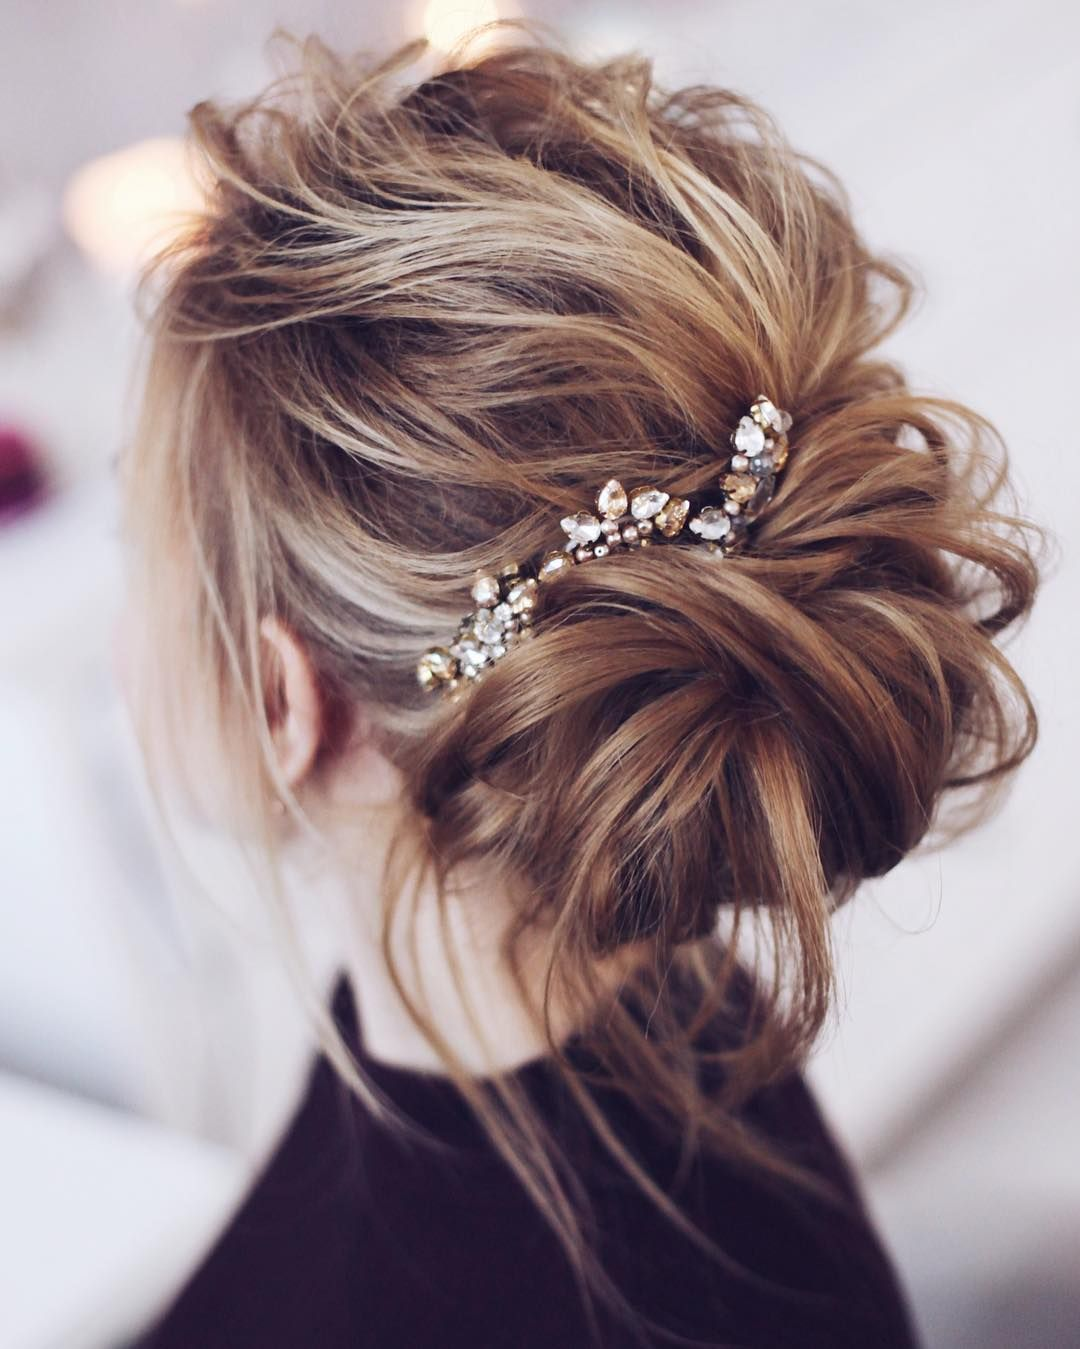 Amazing messy updo hairstyle inspiration